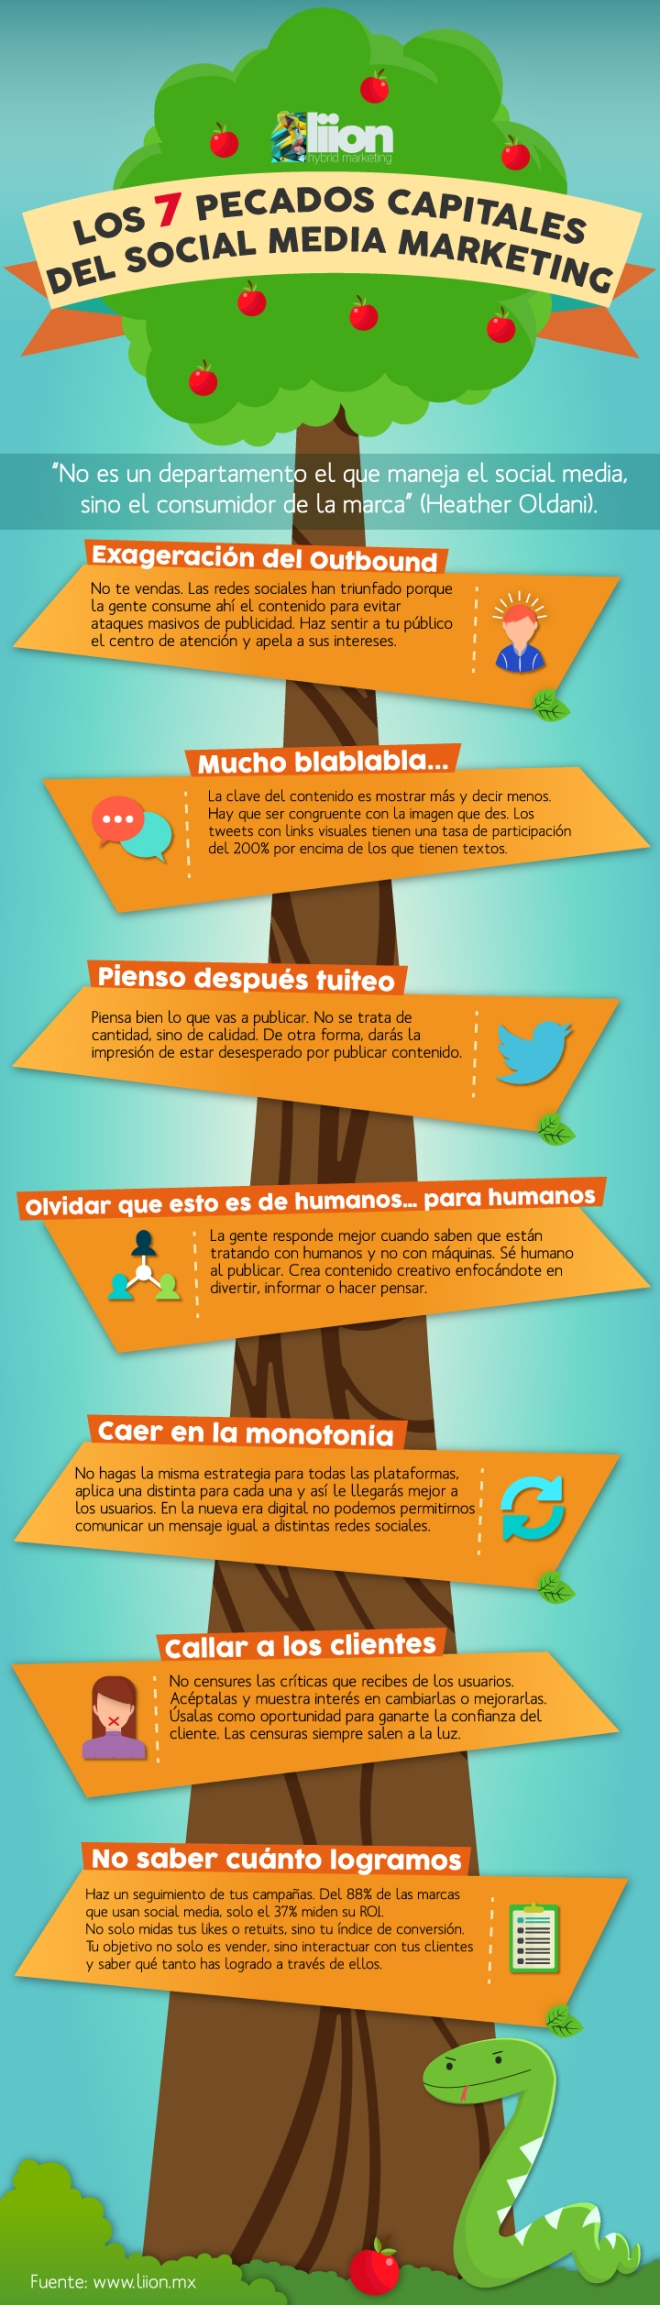 7 pecados capitales del Social Media